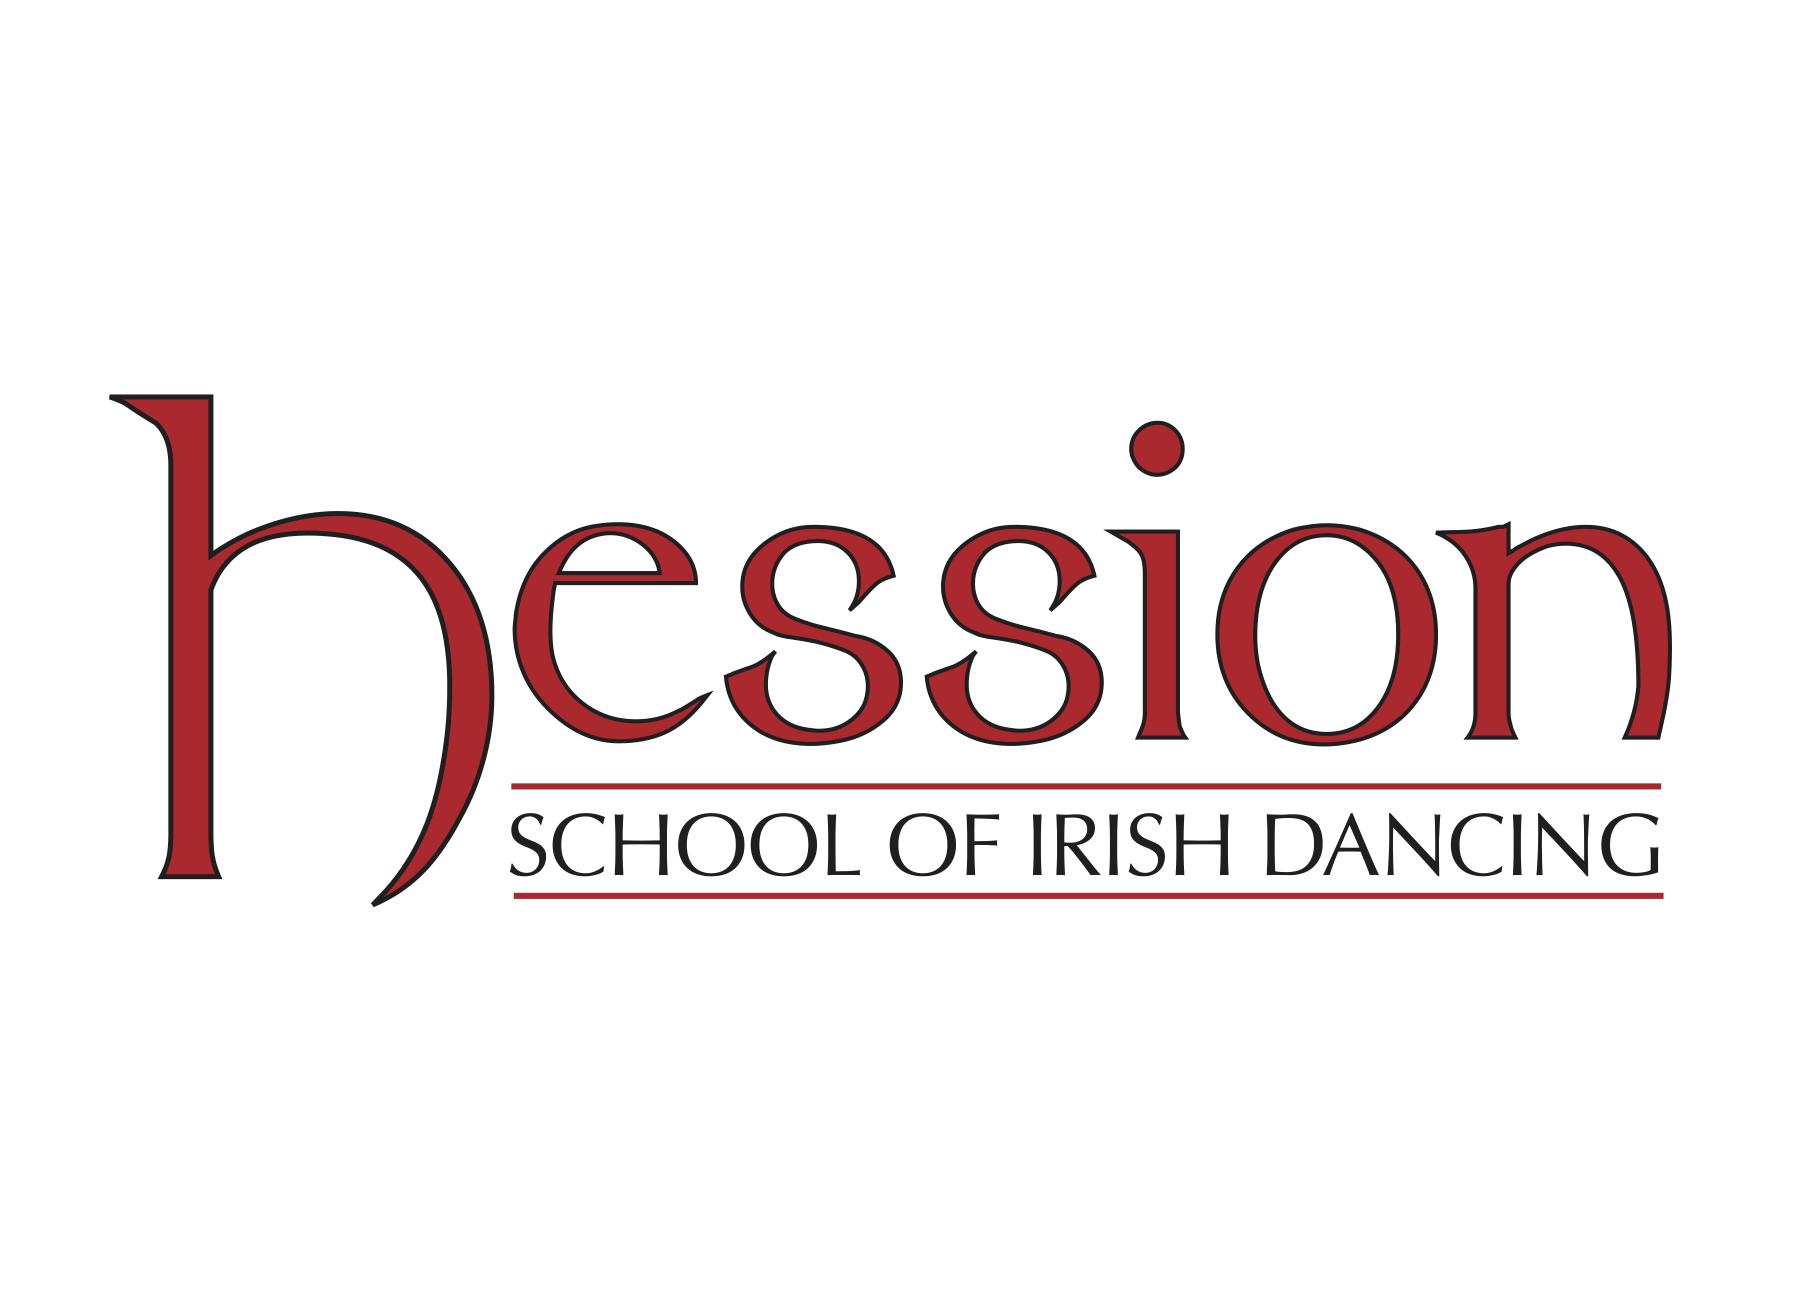 Hession Final Logo[1].jpg